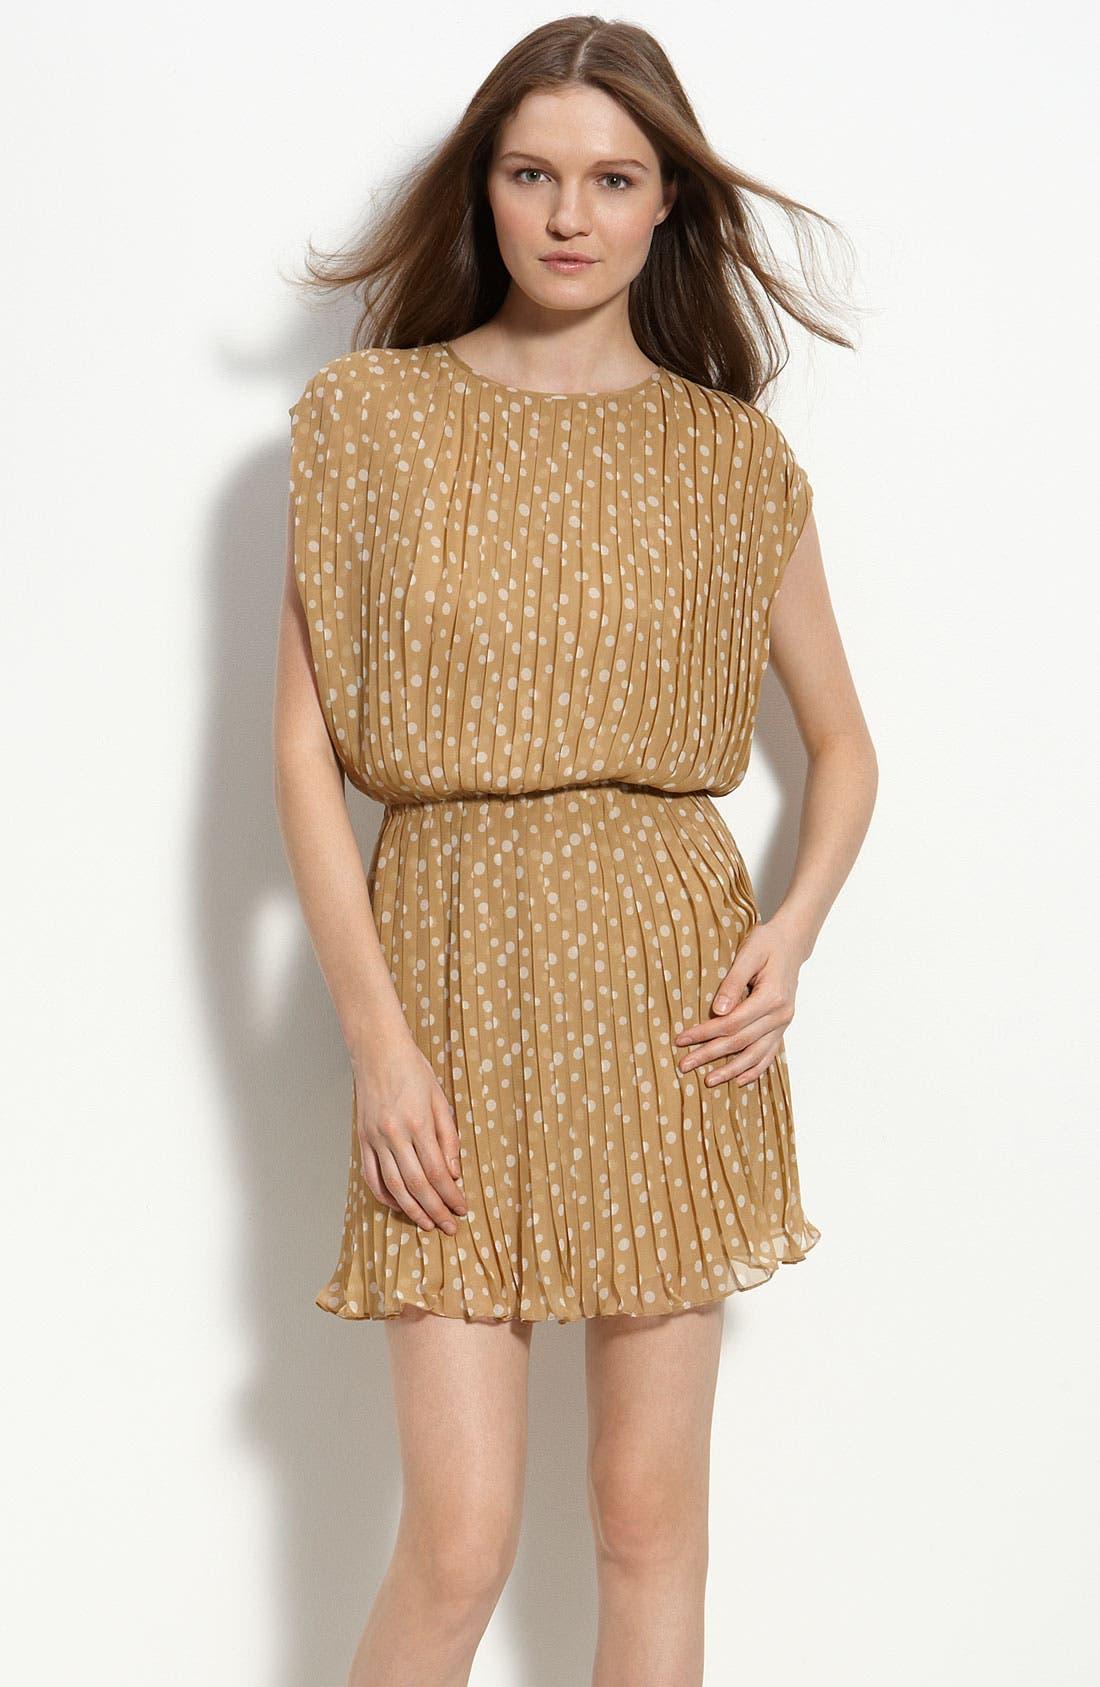 Main Image - RADENRORO 'Adila' Polka Dot Dress